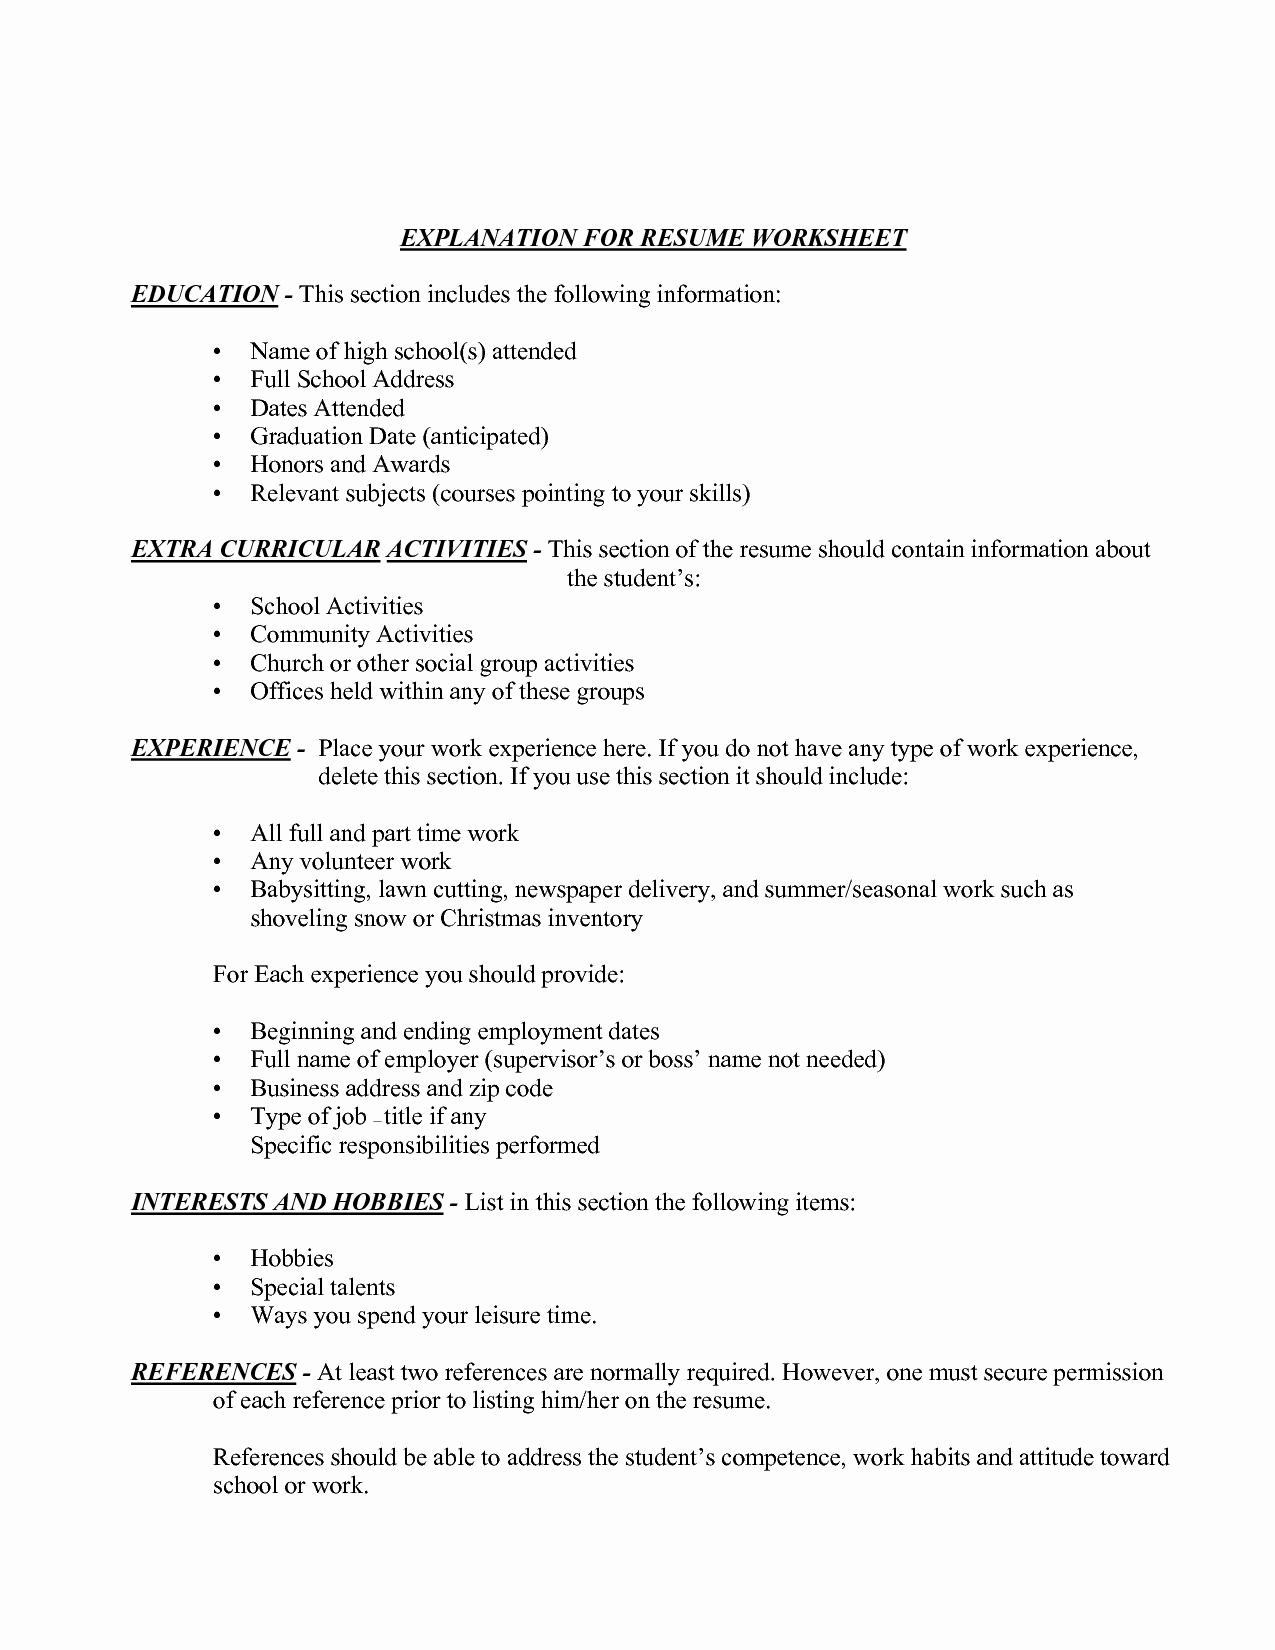 Honors On Resume New 12 Best Of Resume Information Worksheet High